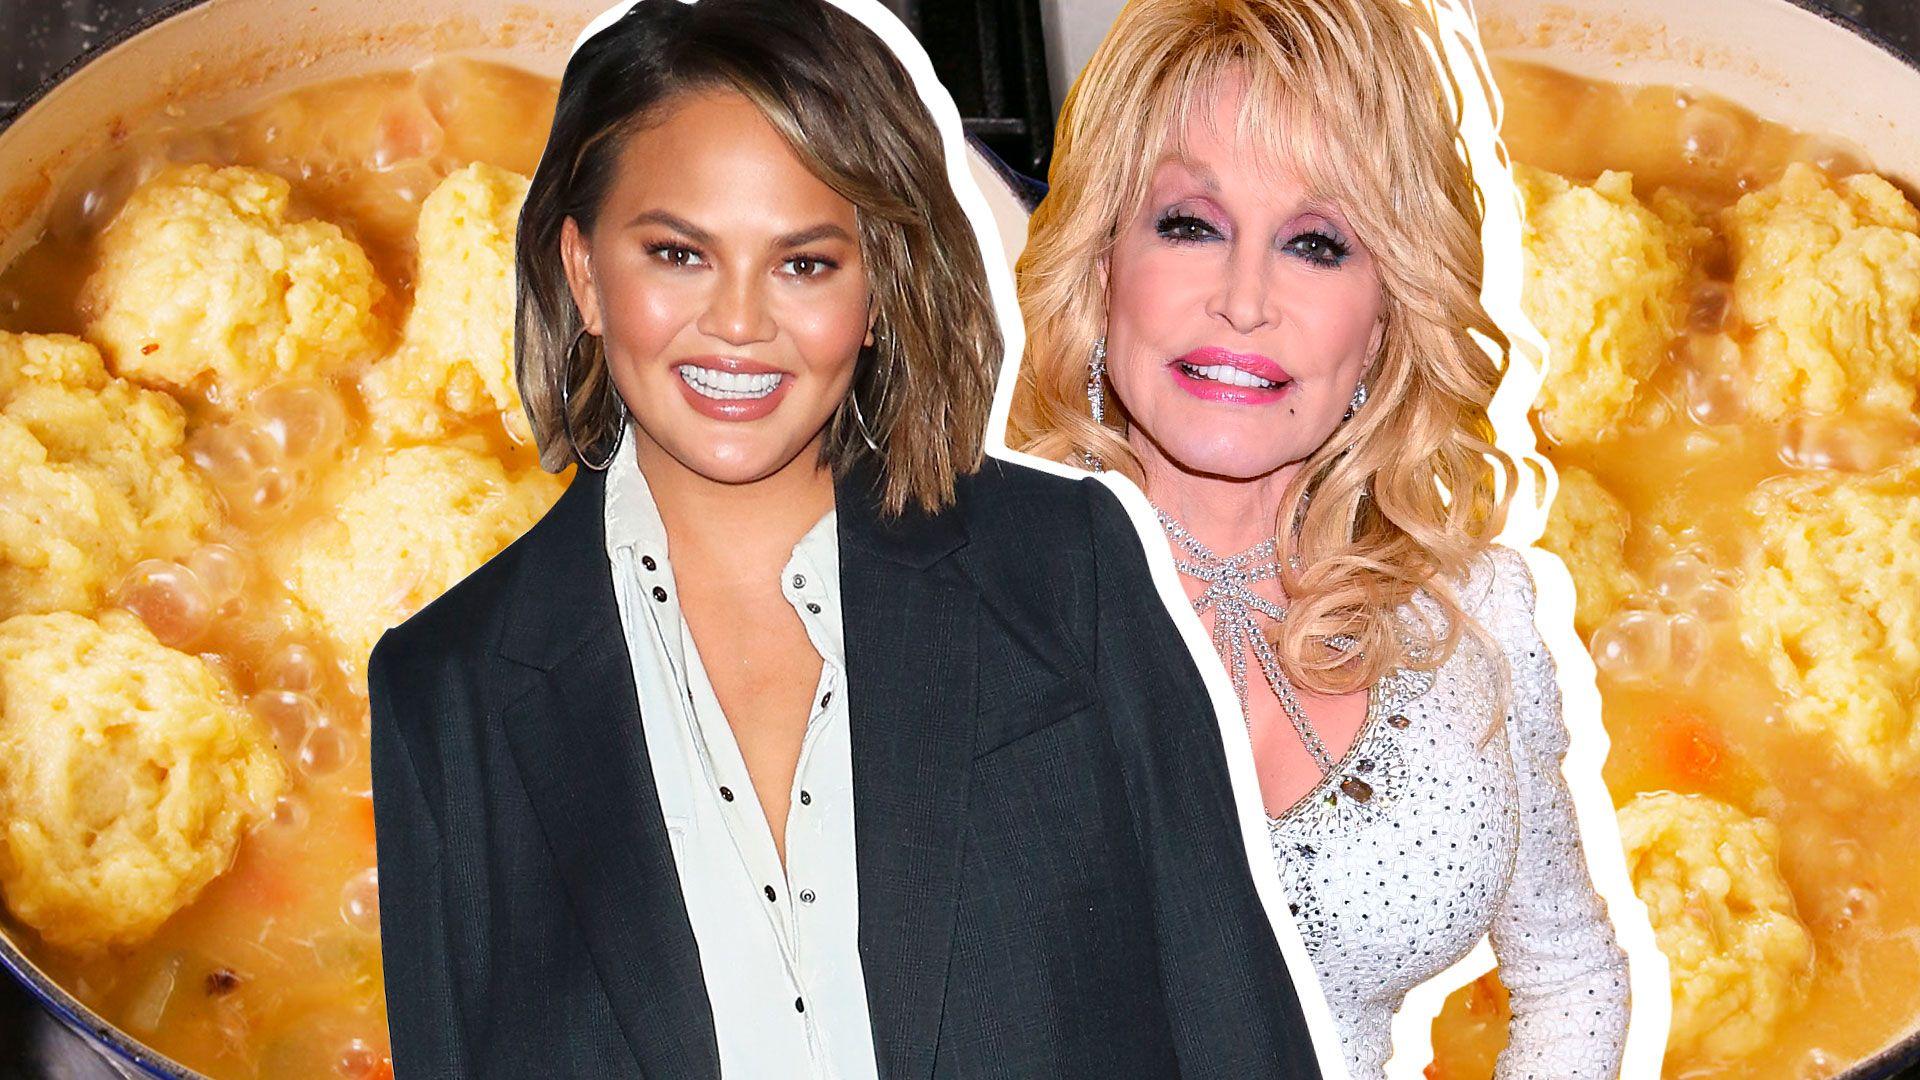 Chrissy Teigen Vs. Dolly Parton: Whose Chicken & Dumplings Are Better?